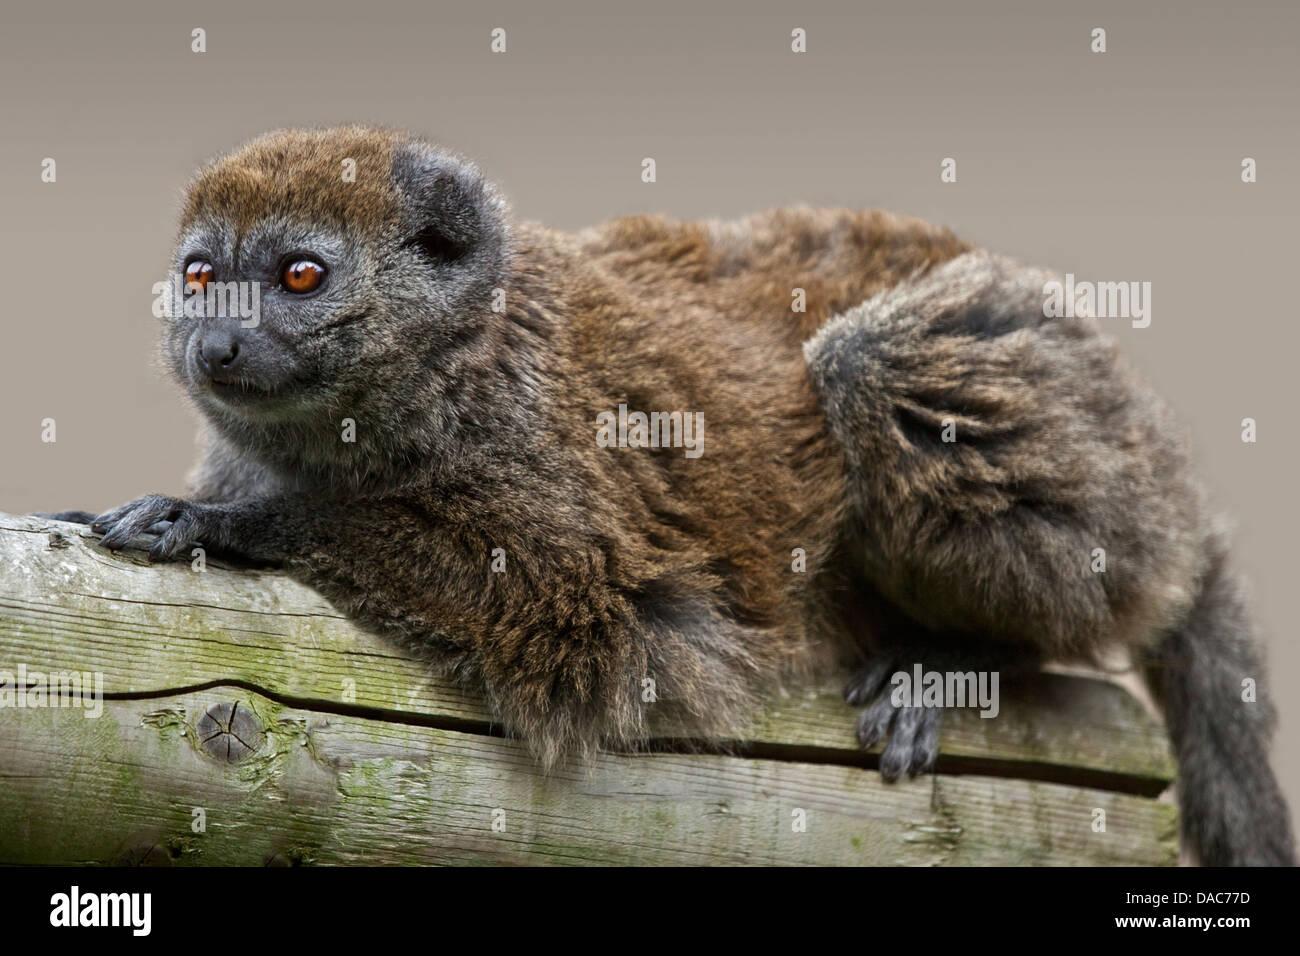 Alaotran Gentle Lemur (hapalemur griseus alaotrensis) - Stock Image